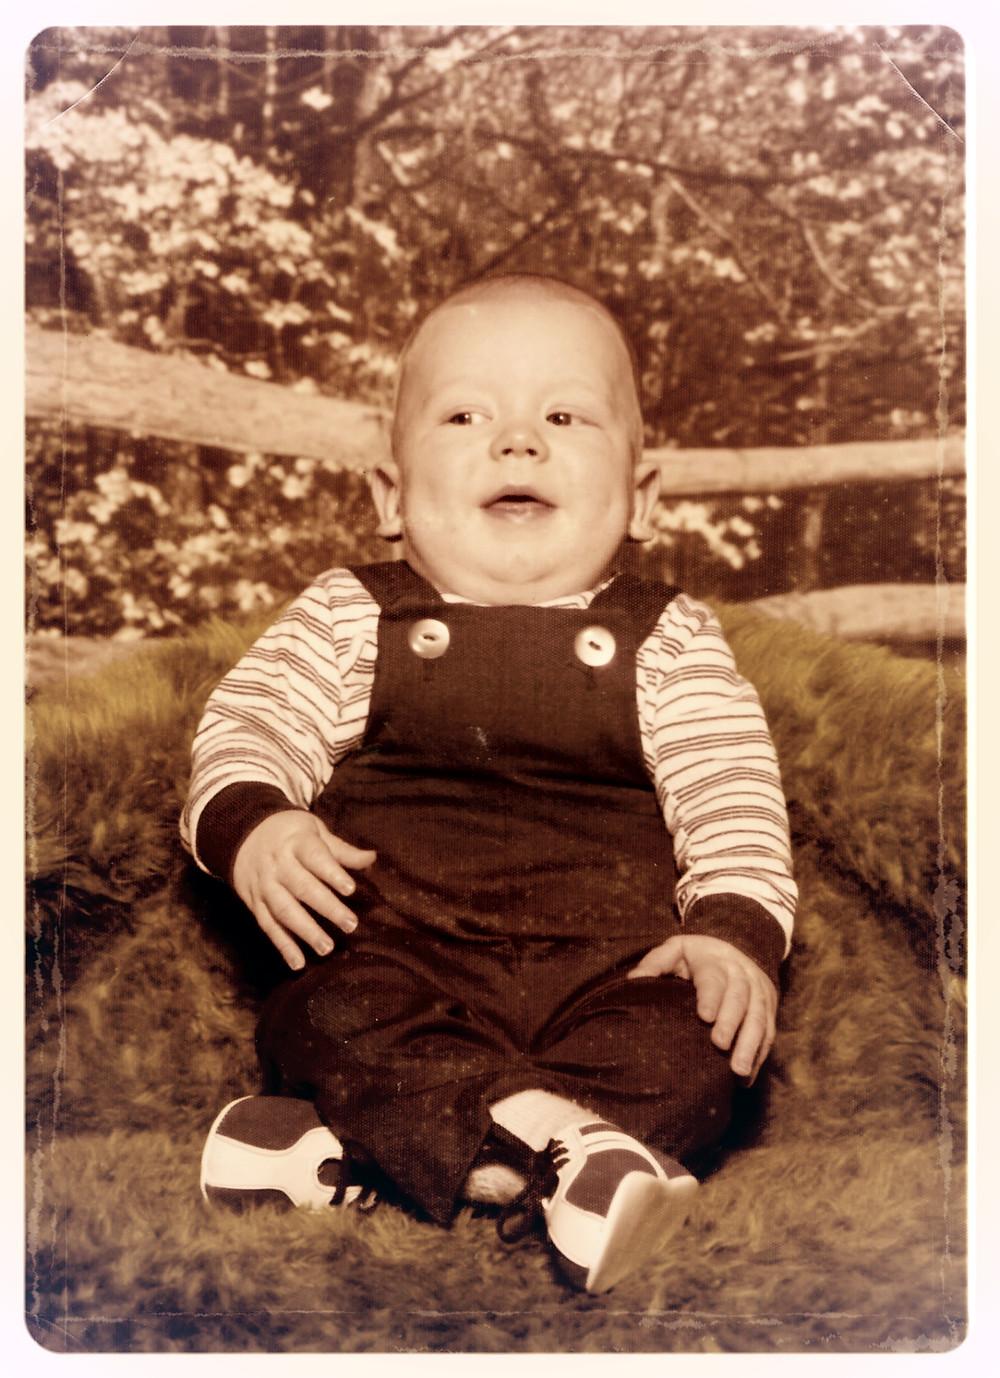 Baby Travis_edited.JPG